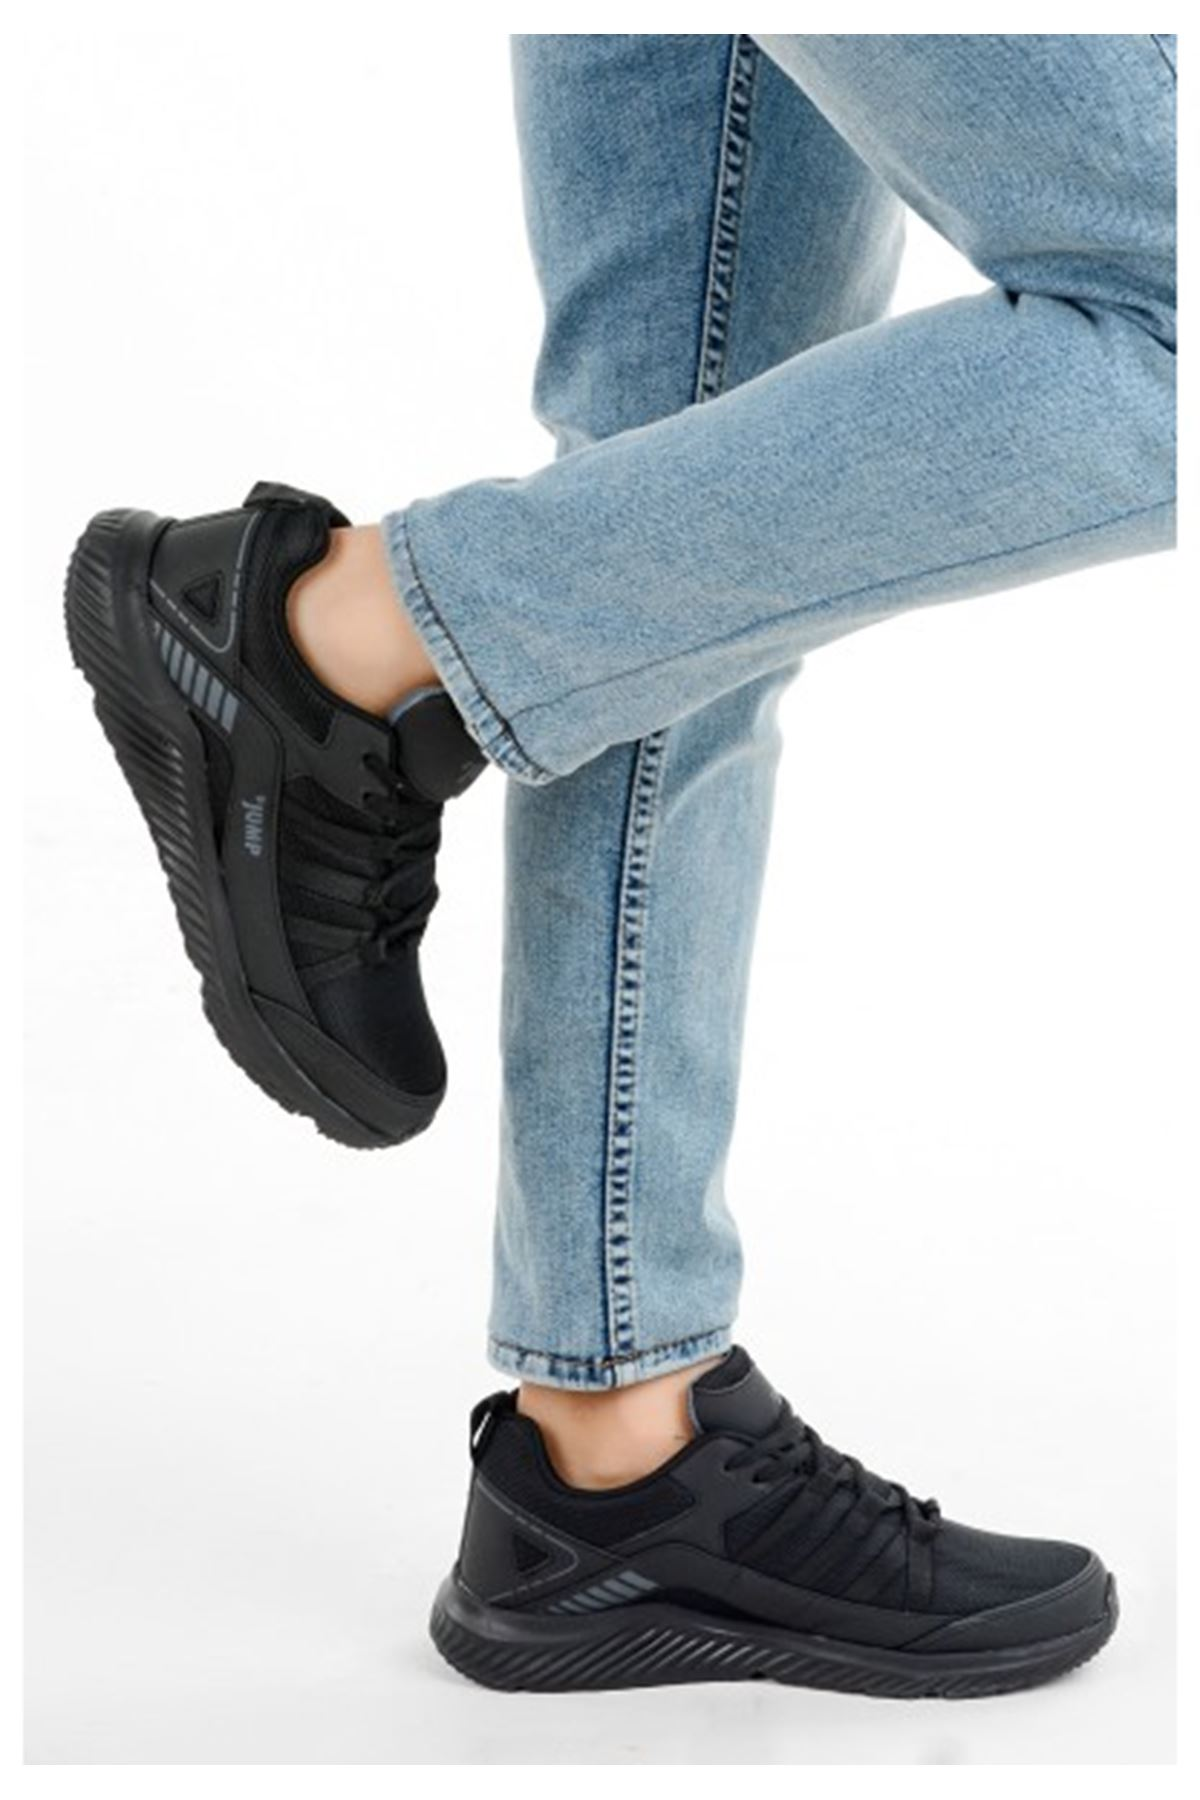 Erkek Spor Ayakkabı Fileli Rahat 24865 FULL SİYAH